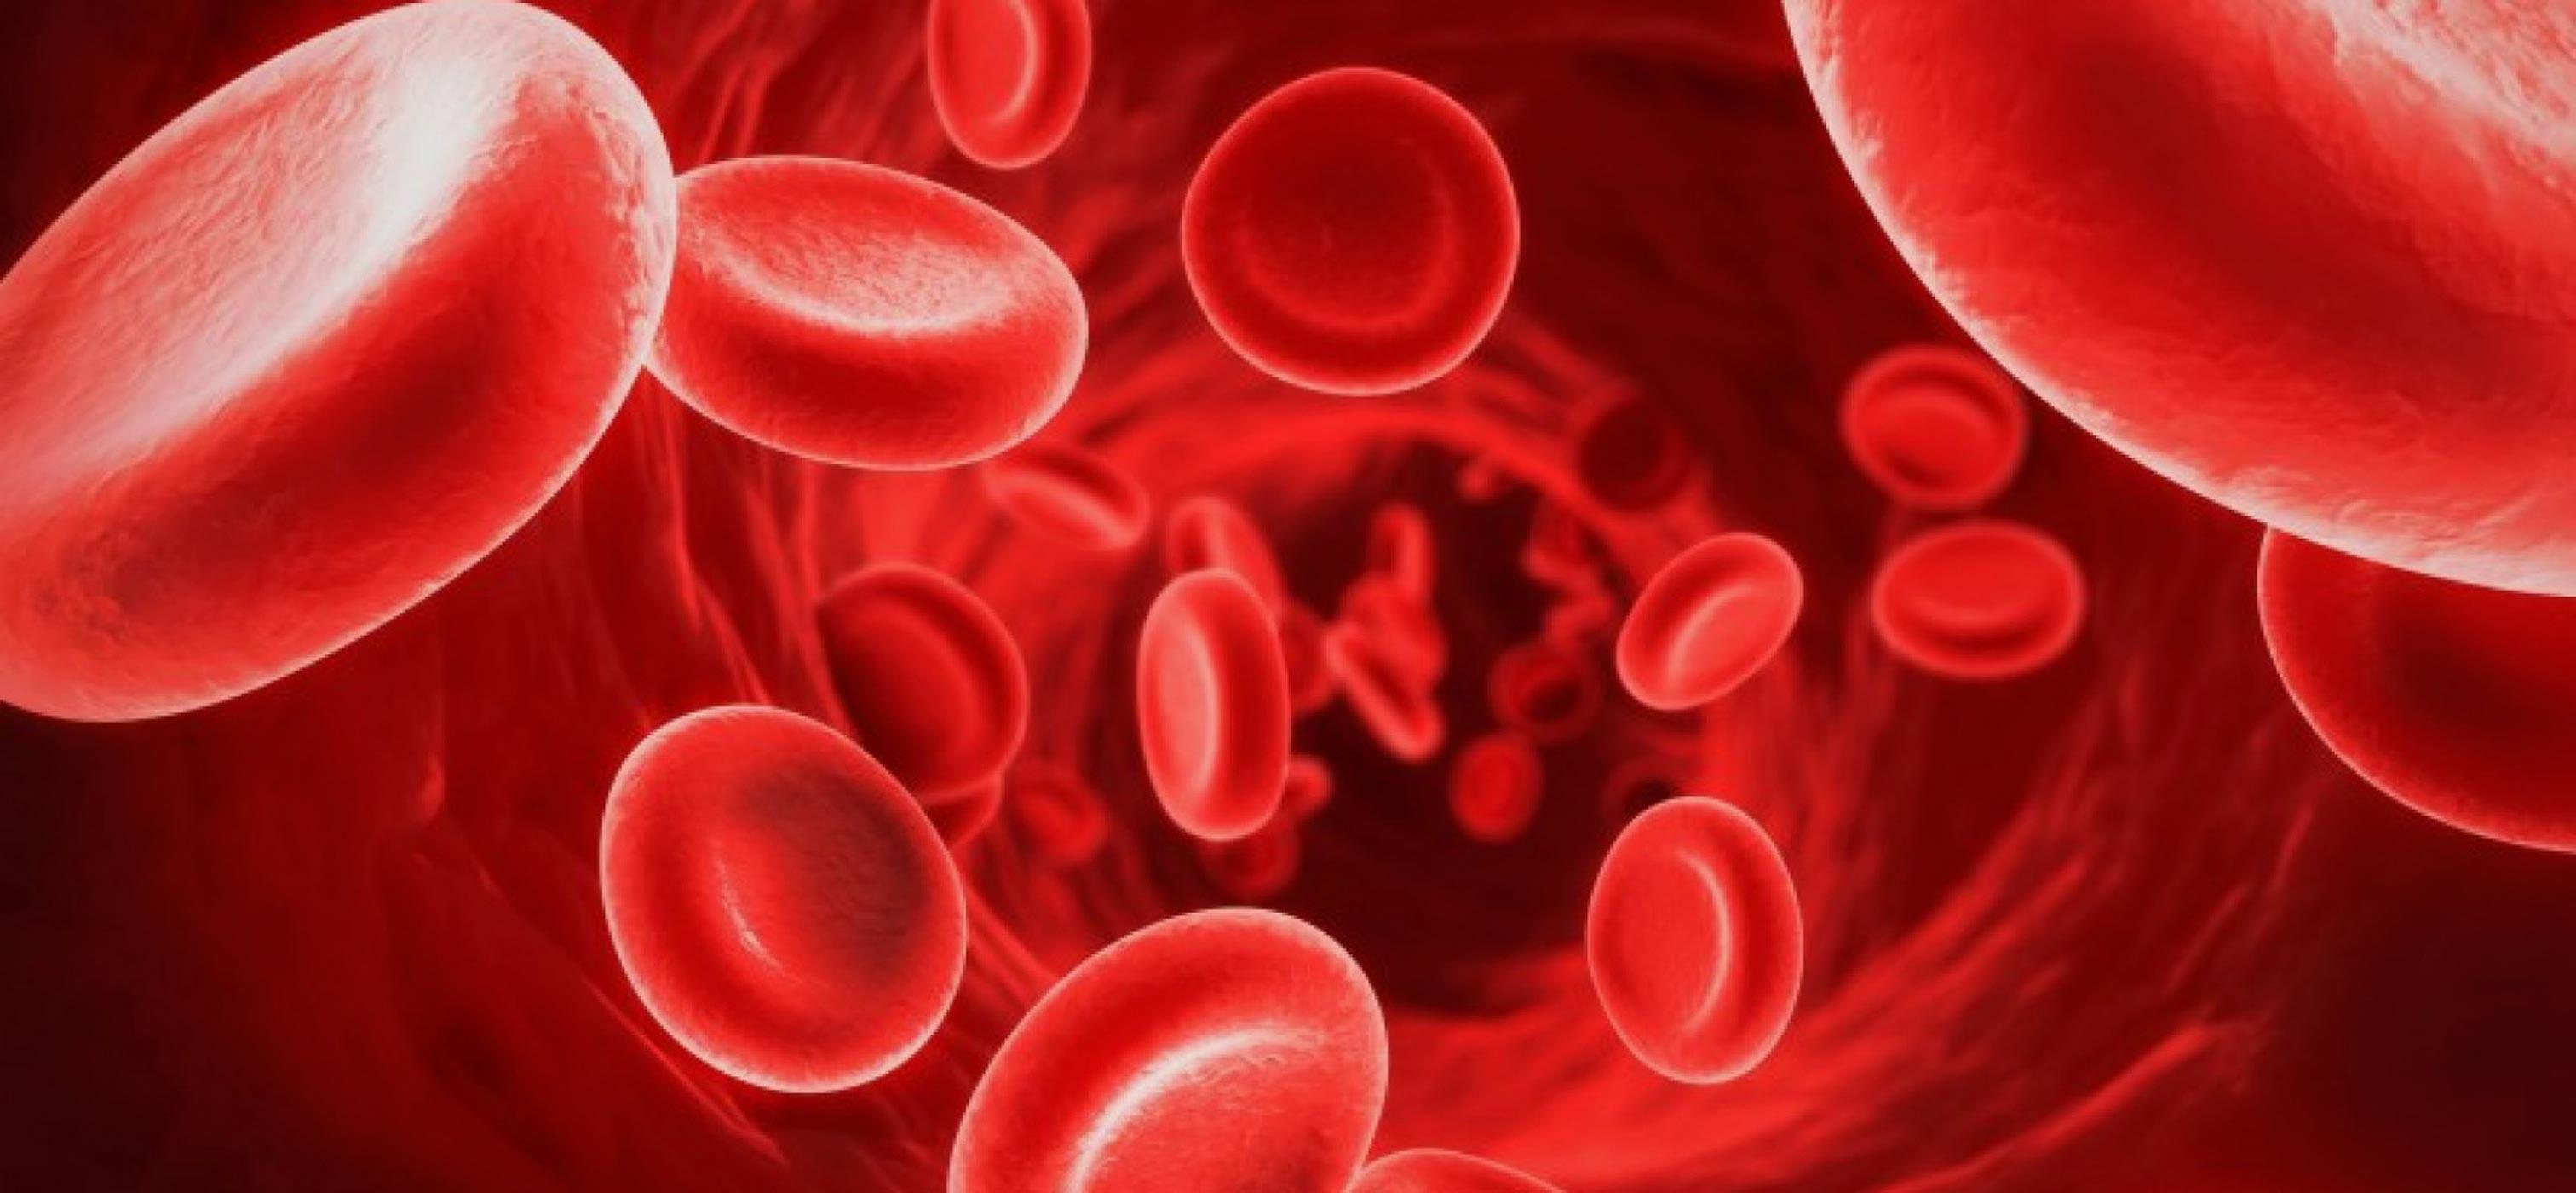 Emofilia: sintomi, cause e cure